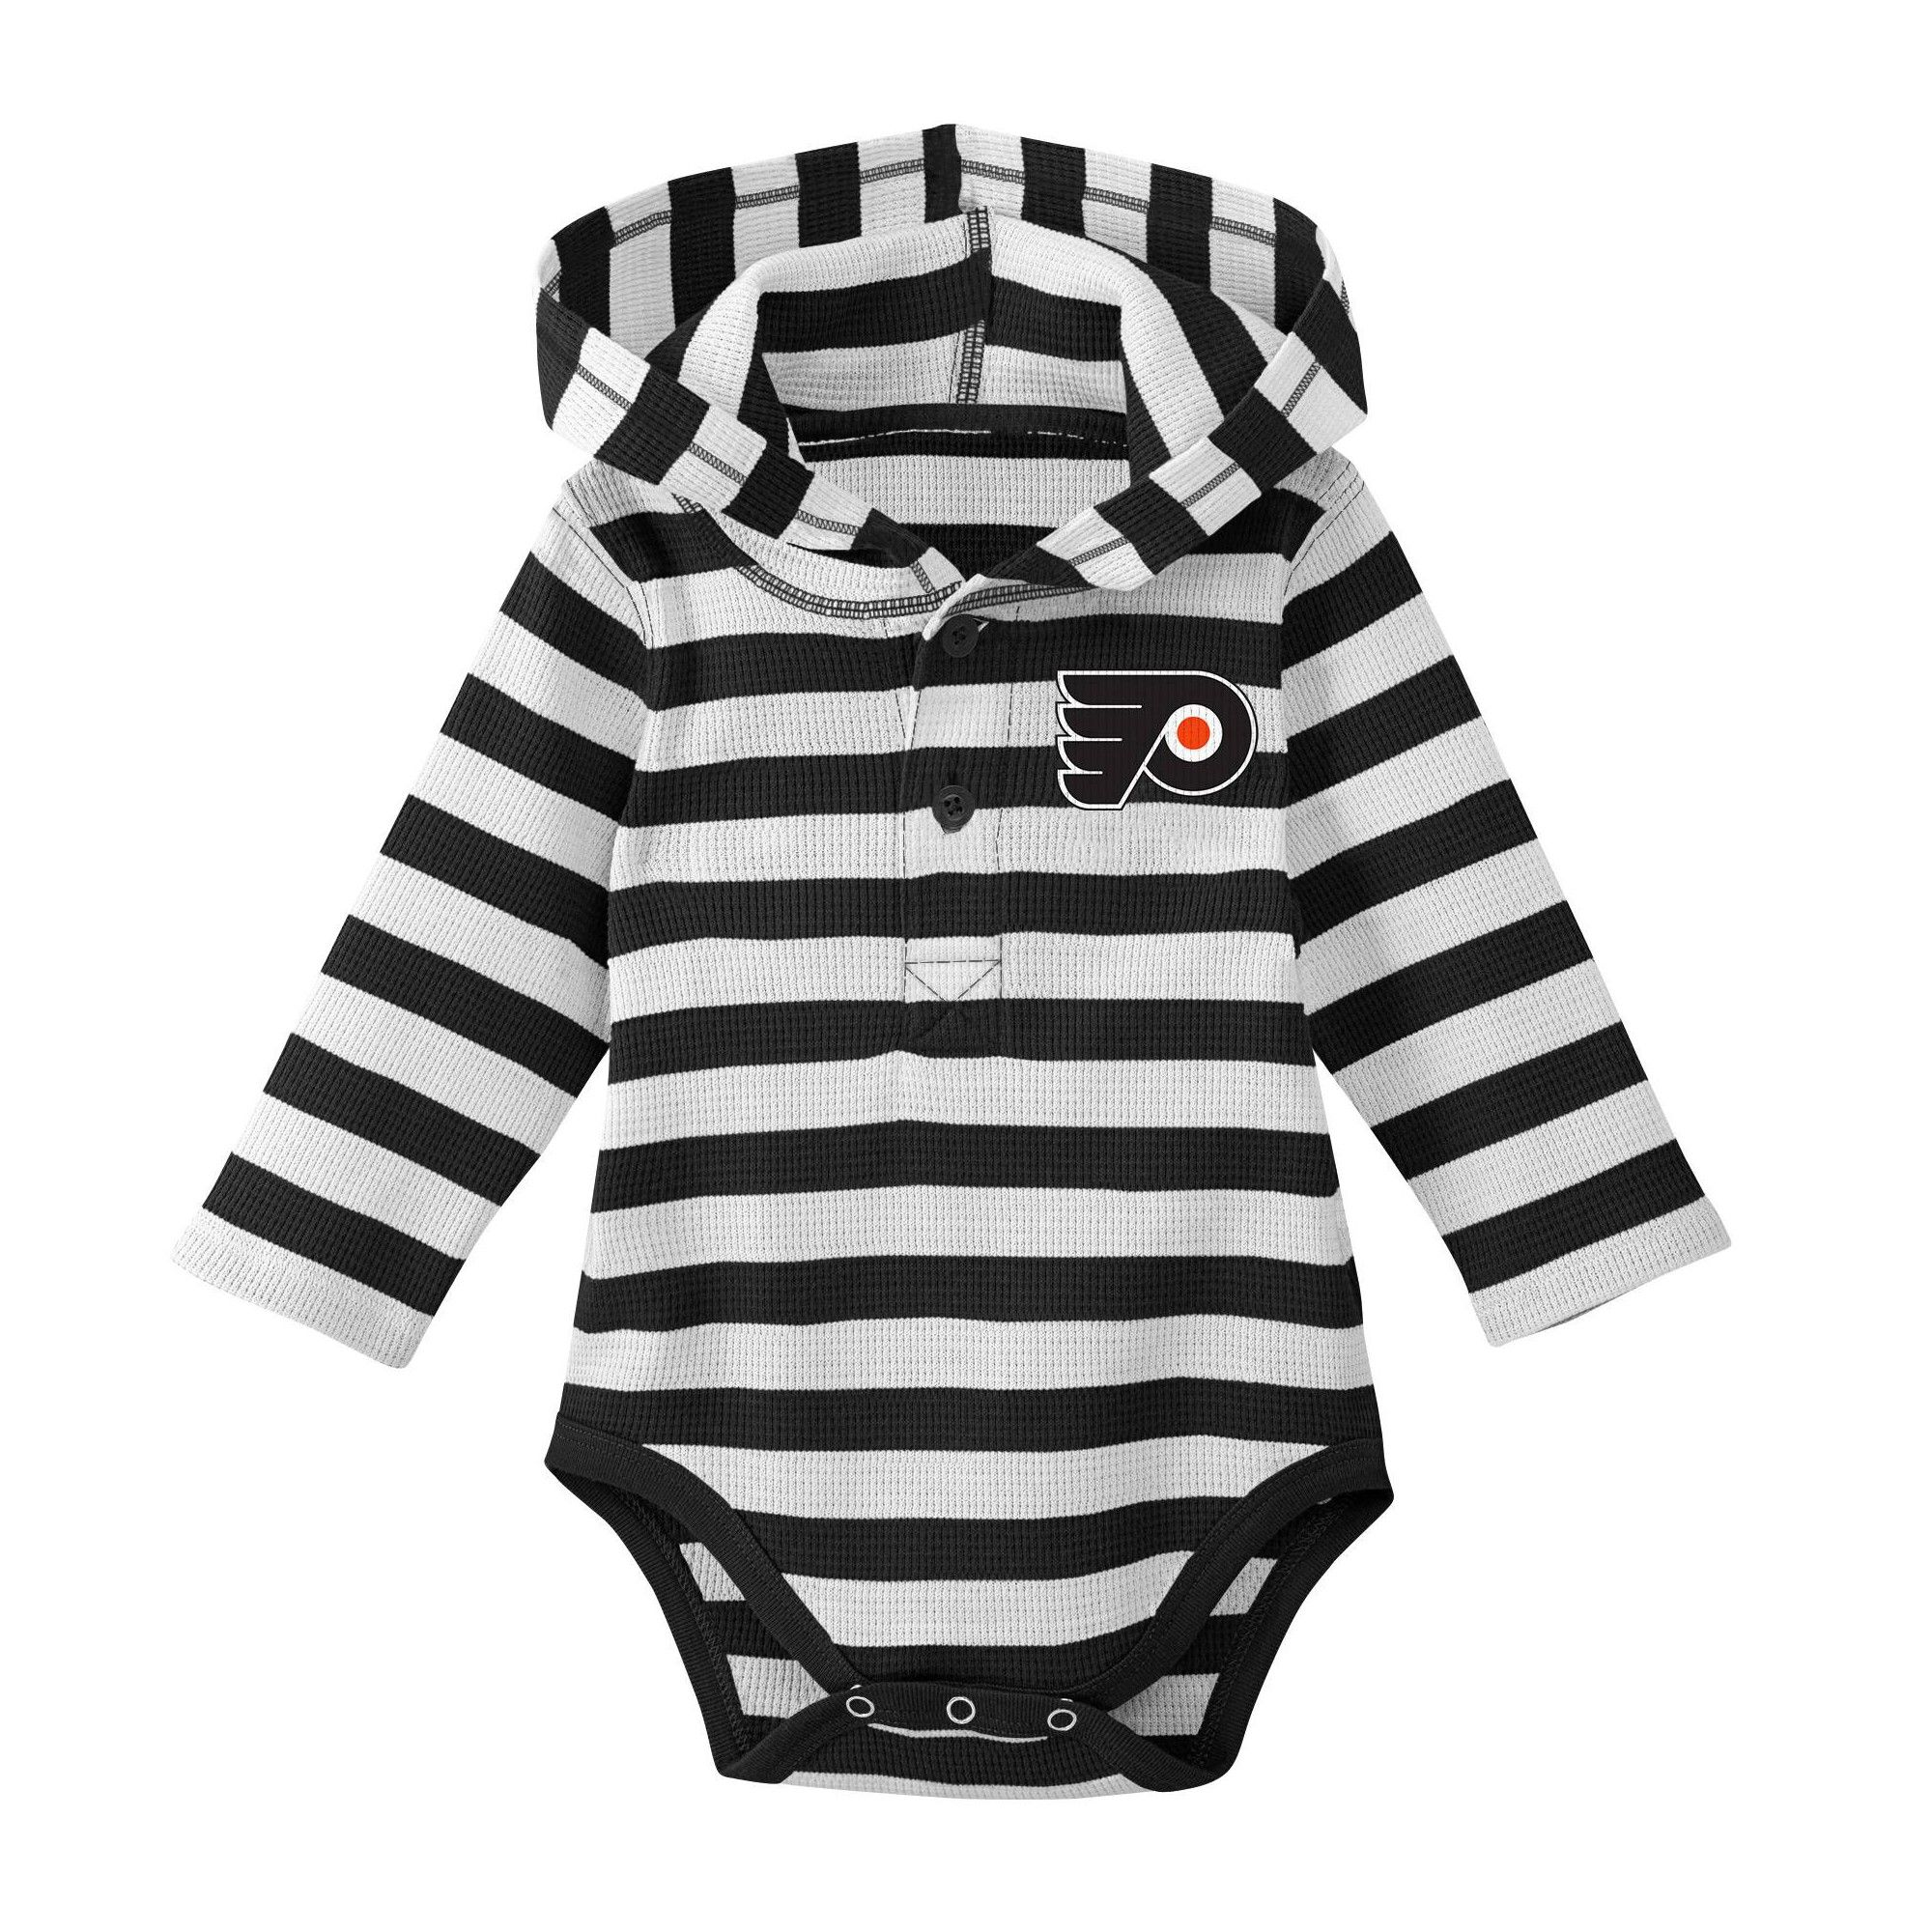 6fa5b222ad22 Philadelphia Flyers Boys' Newborn/Infant Sleeper Bodysuit - 0-3M,  Multicolored